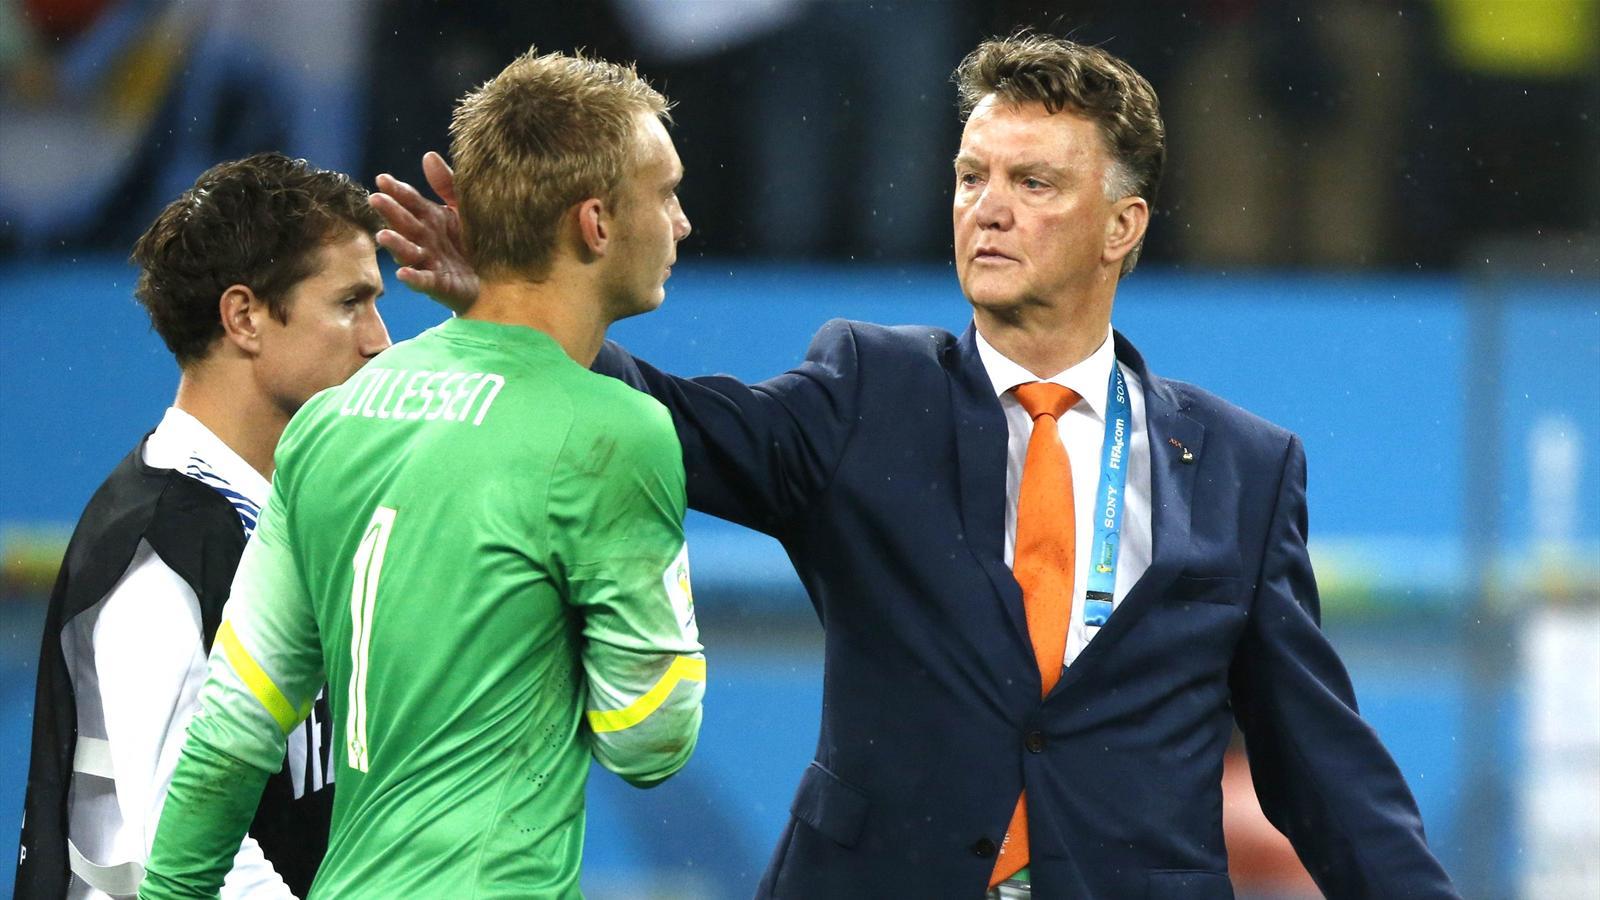 Louis van Gaal embraces Netherlands goalkeeper Jasper Cillessen at the 2014 World Cup in Brazil